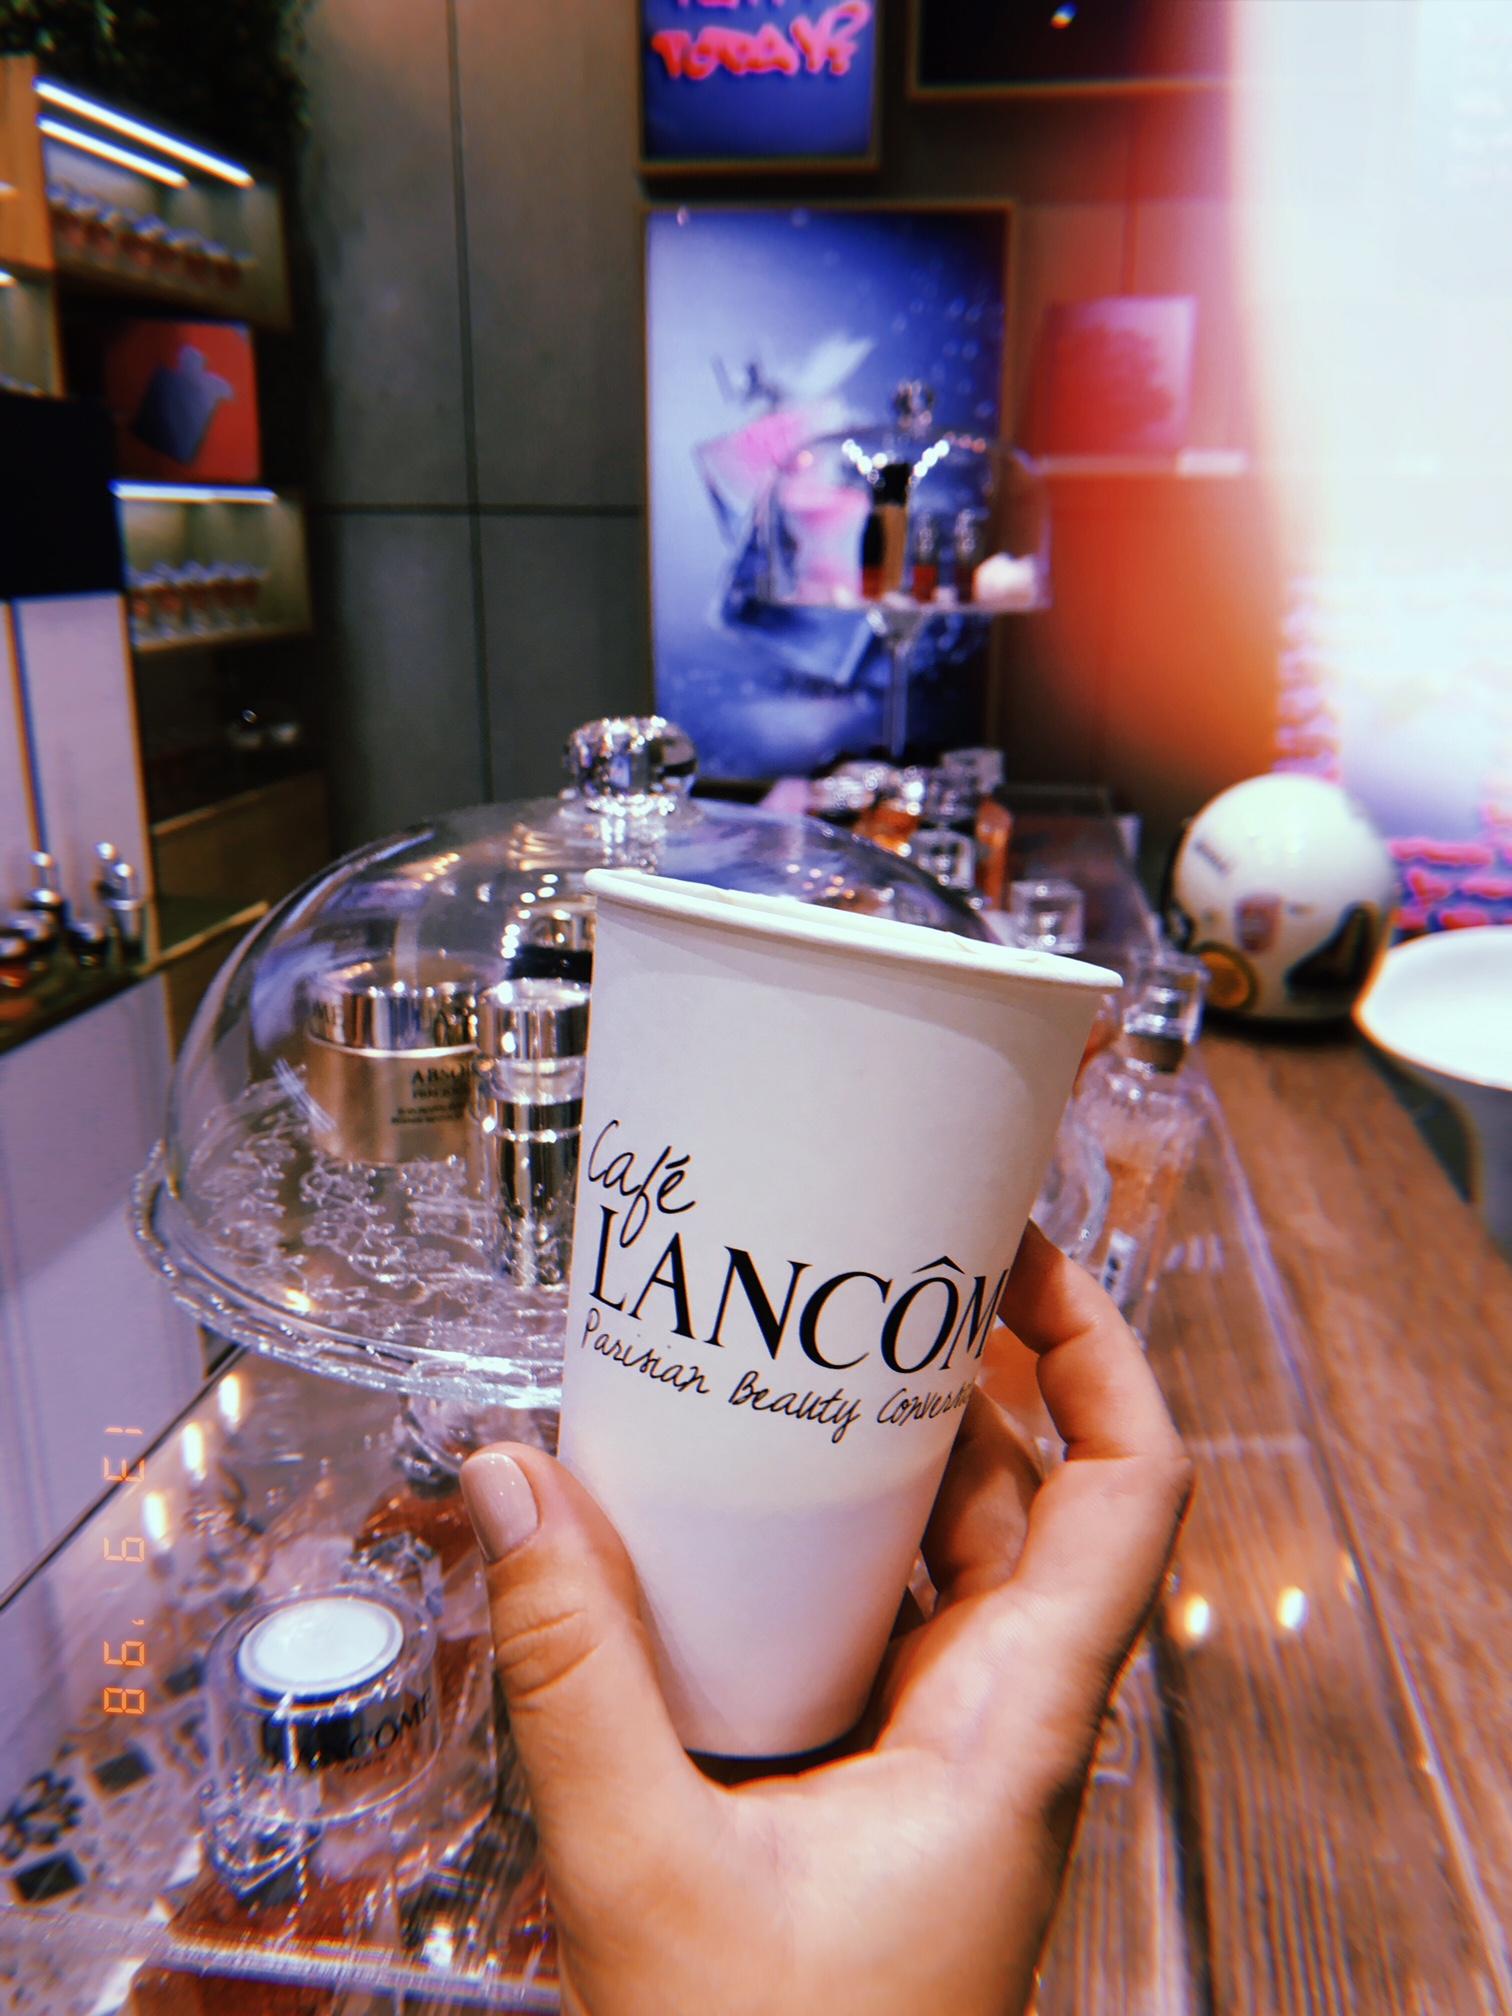 Lancome Cafe Bulgaria